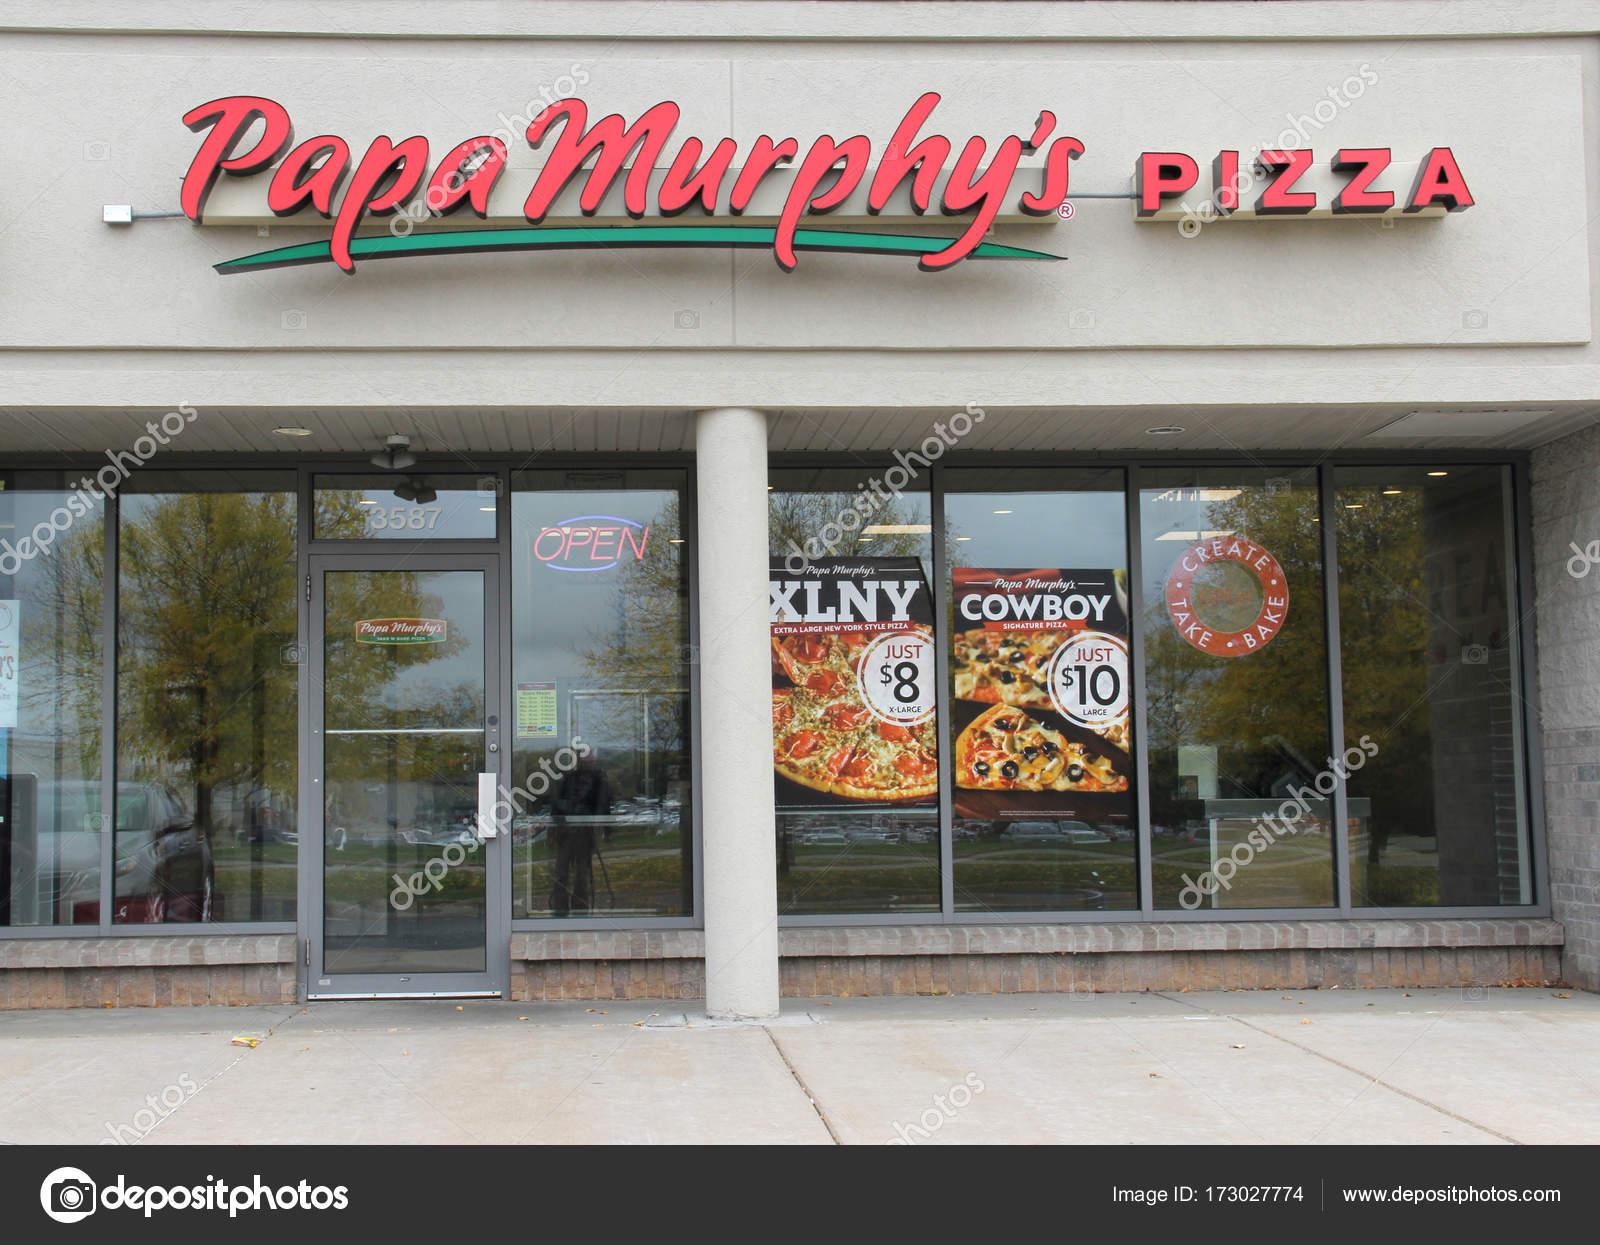 Papa murphys pizza sign on a storefront stock editorial photo papa murphys pizza sign on a storefront stock photo buycottarizona